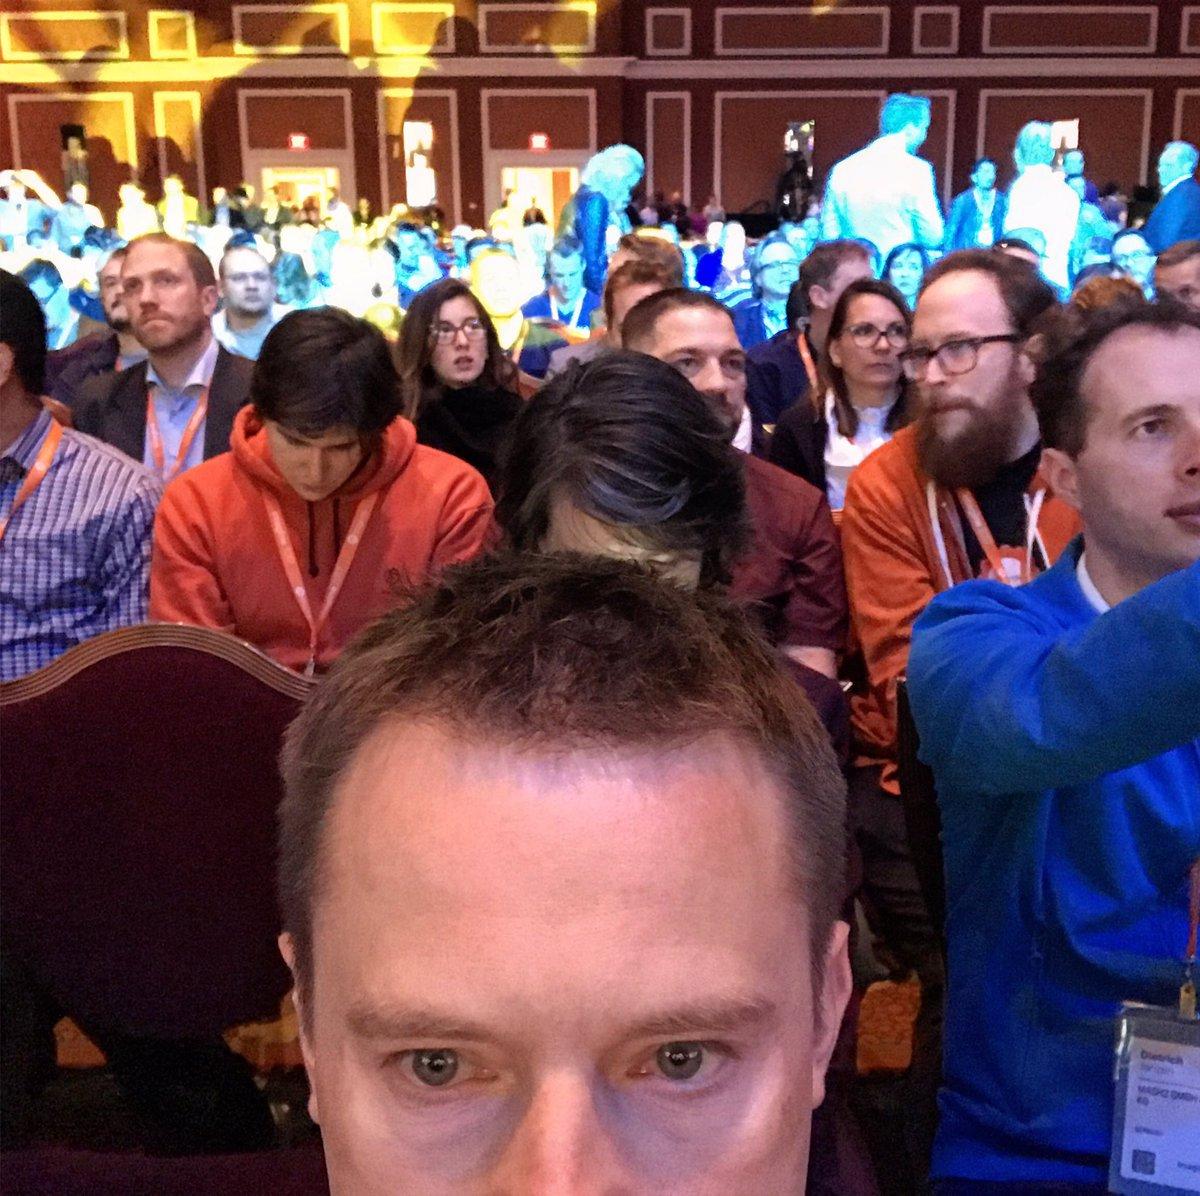 krzysdan: #MagentoImagine audience and me https://t.co/WIjLxWrMn0